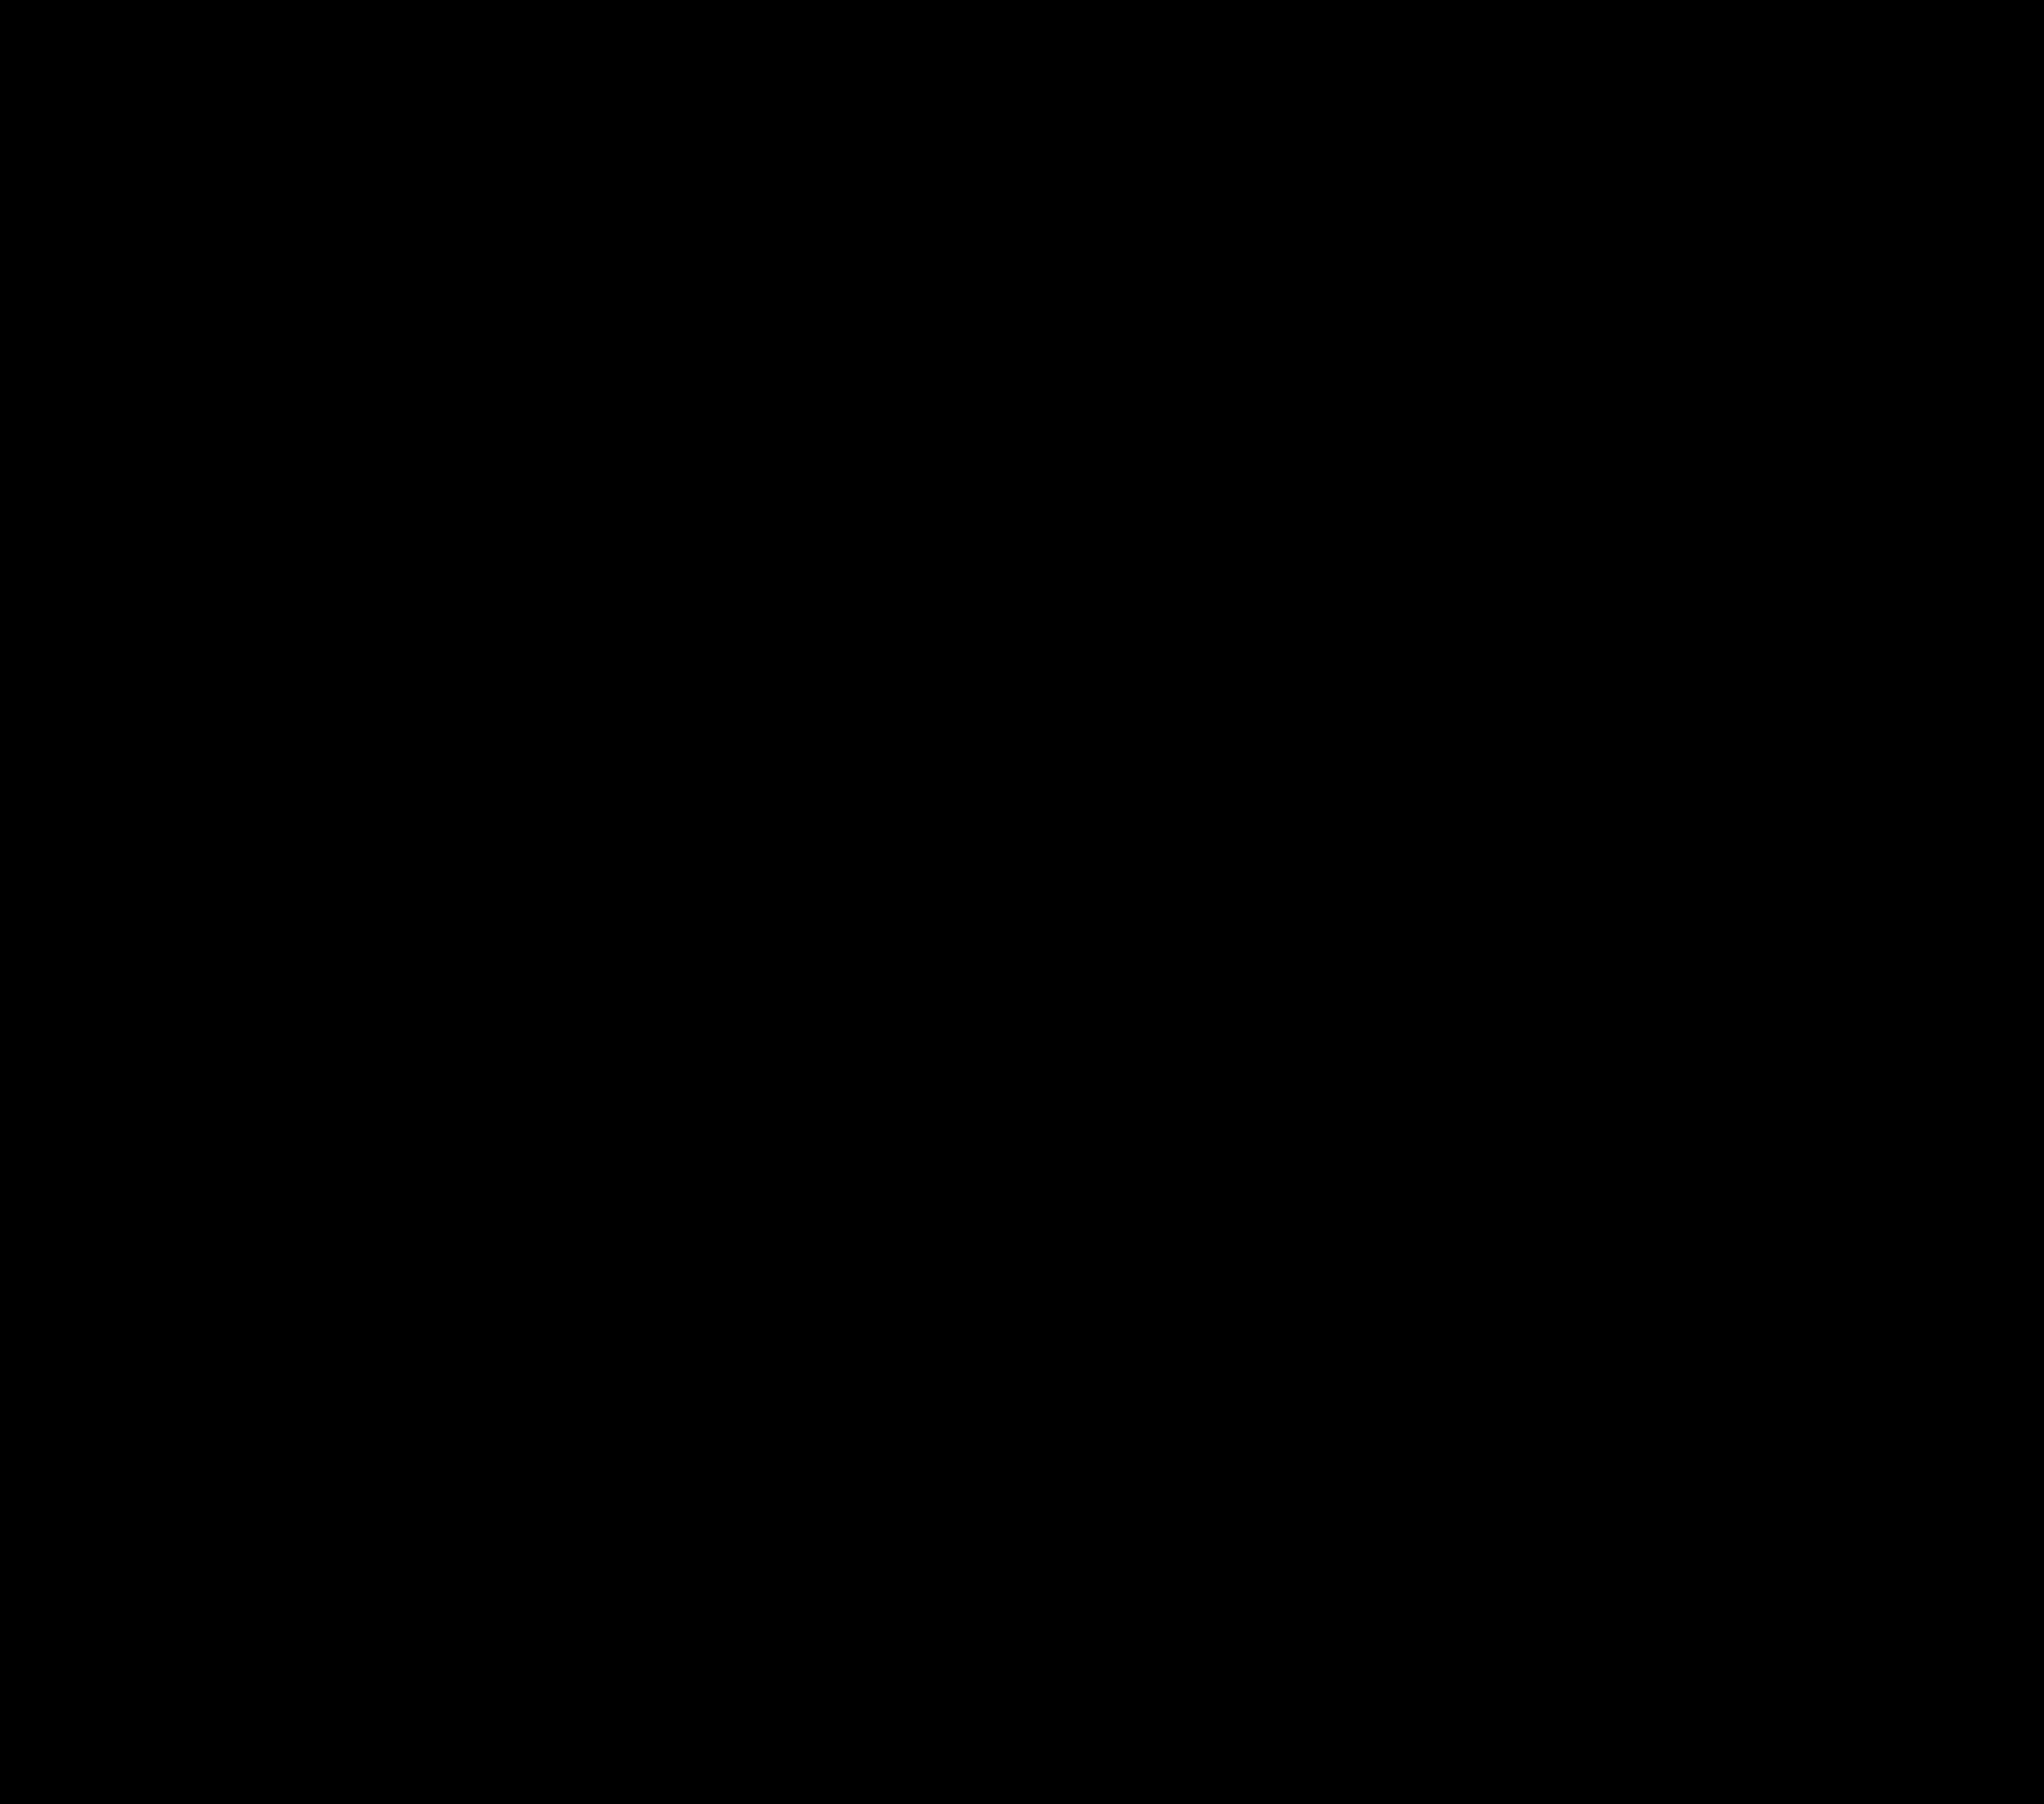 Clipart hand signature. Capital g